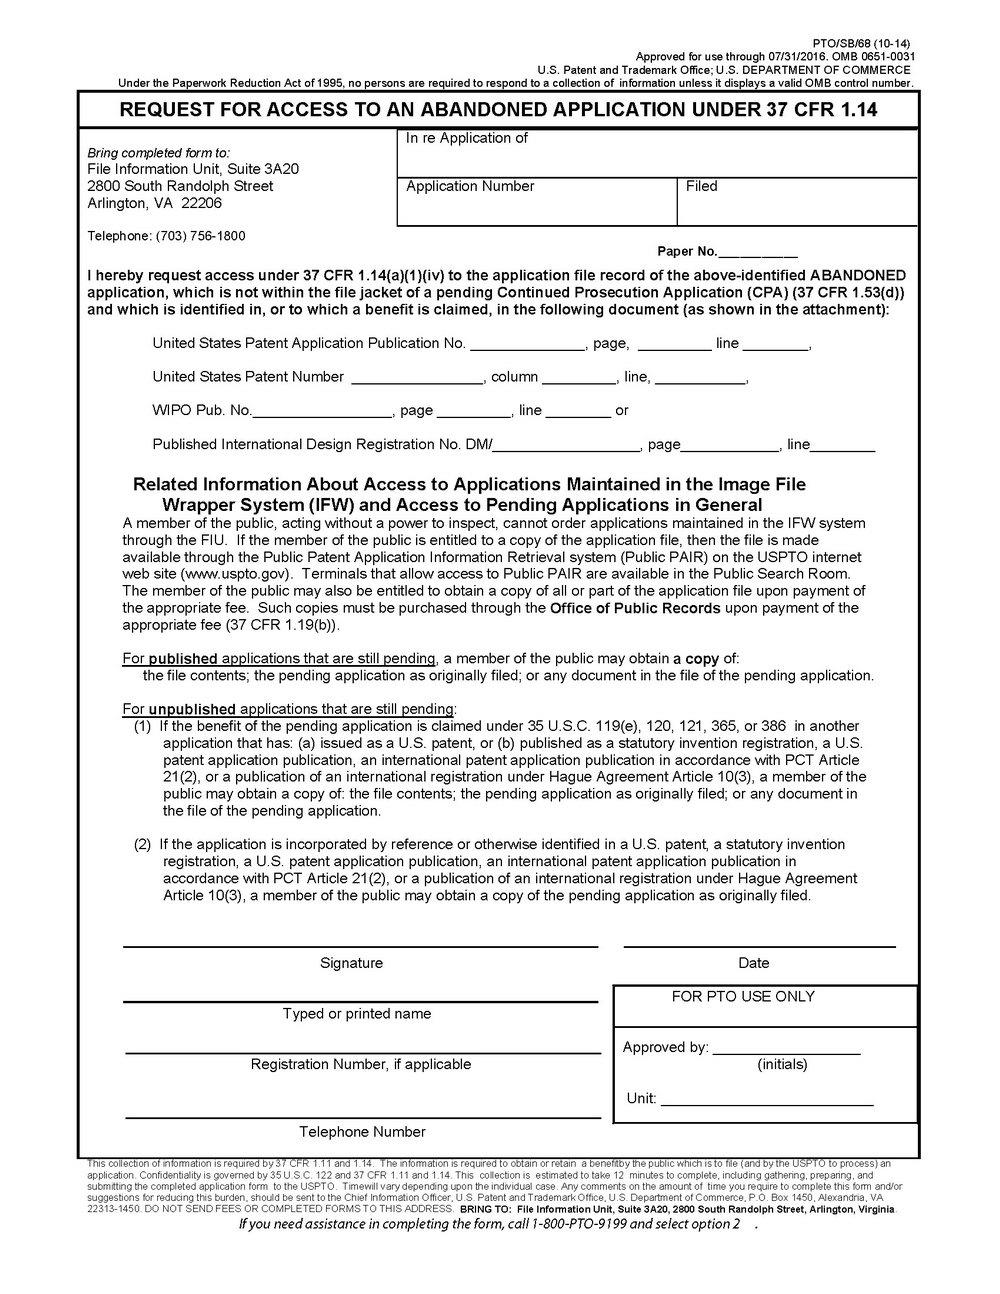 Provisional Patent Application Form Pdf